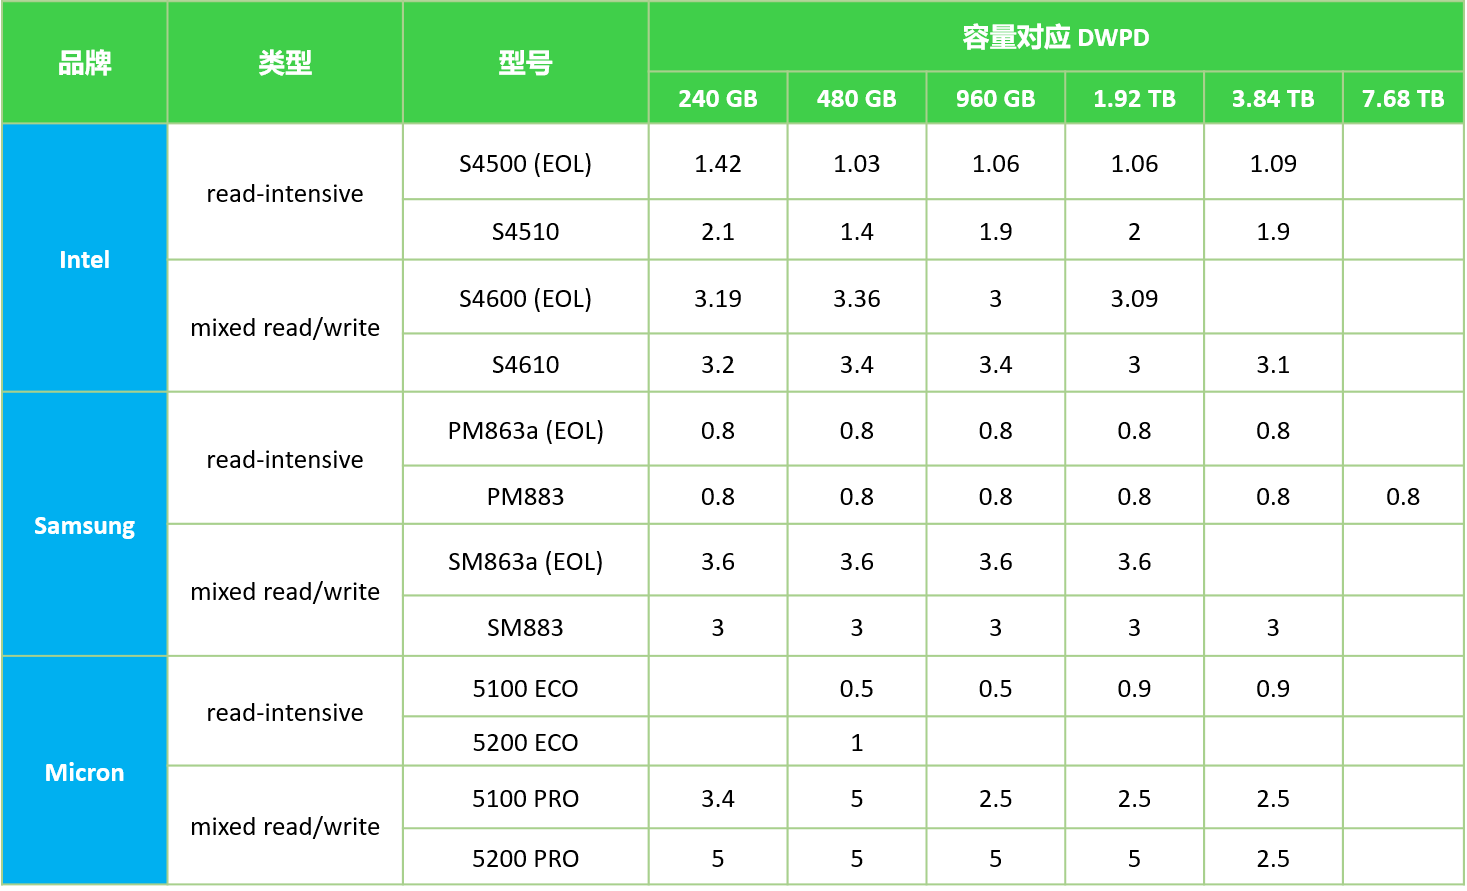 SSD-capacity-DWPD.png